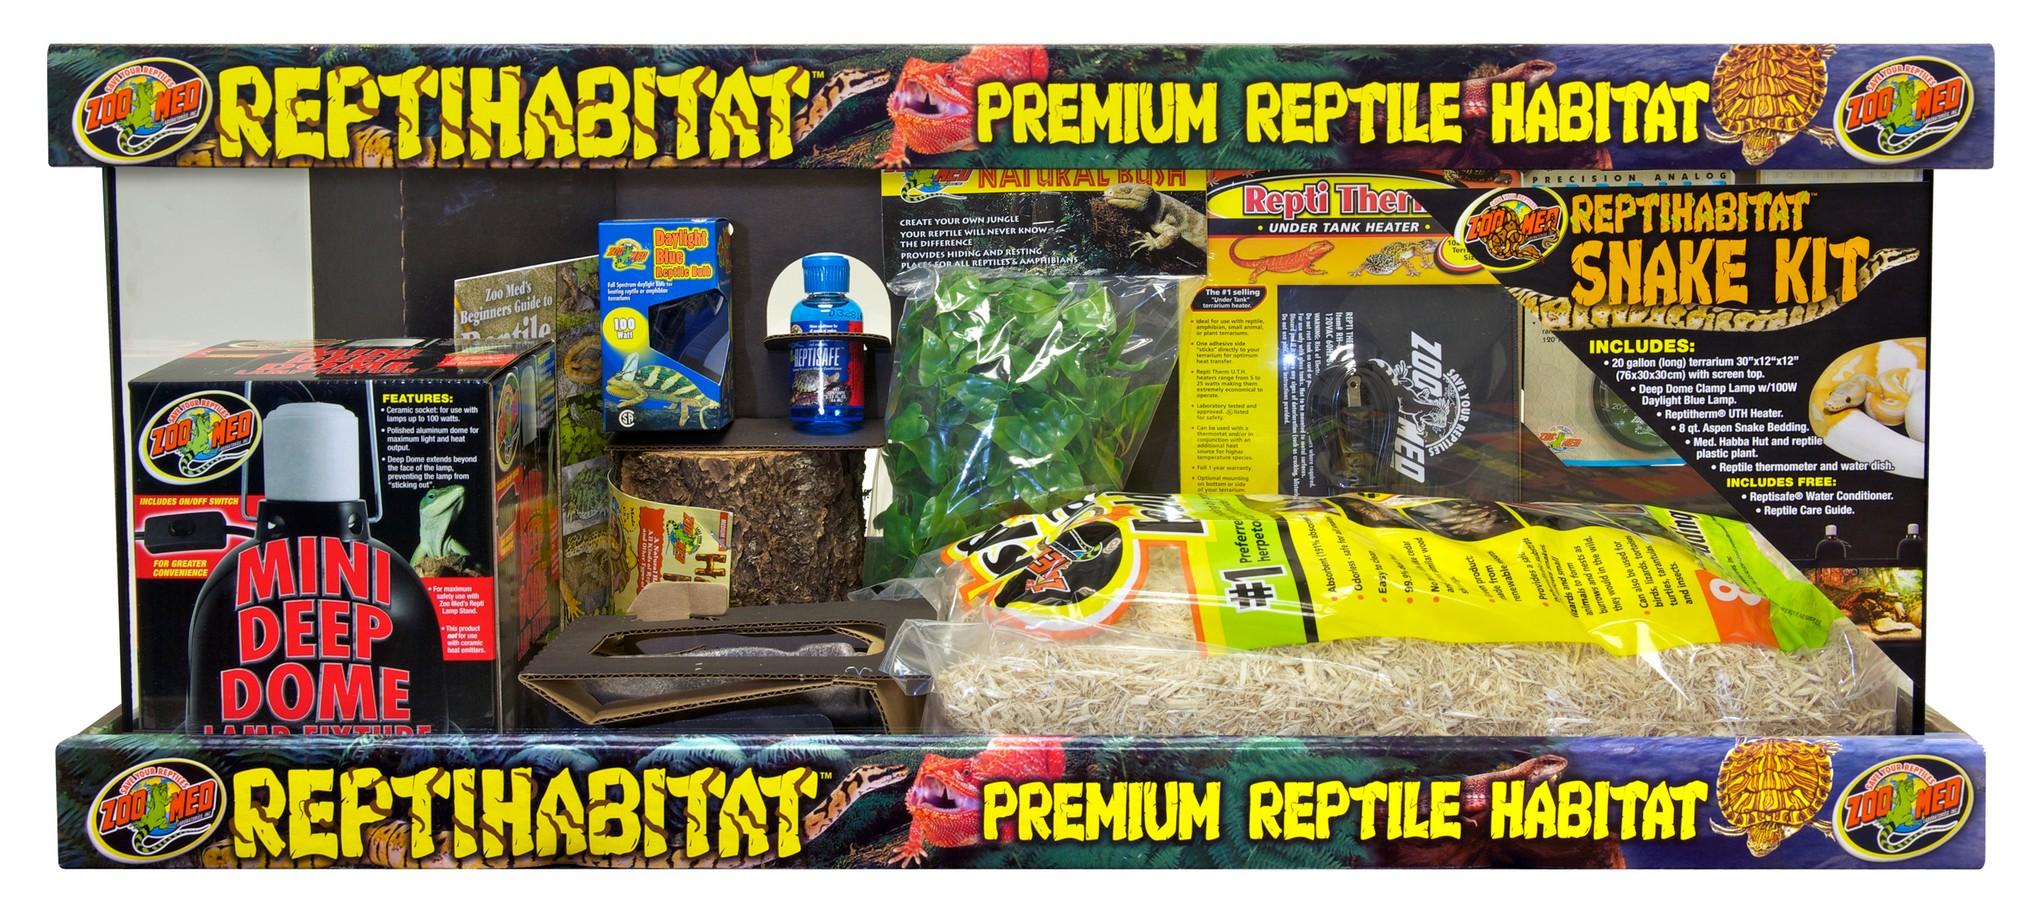 Zoo Med Reptihabitat Snake Kit Premium Reptile Habitat, 20-gallon